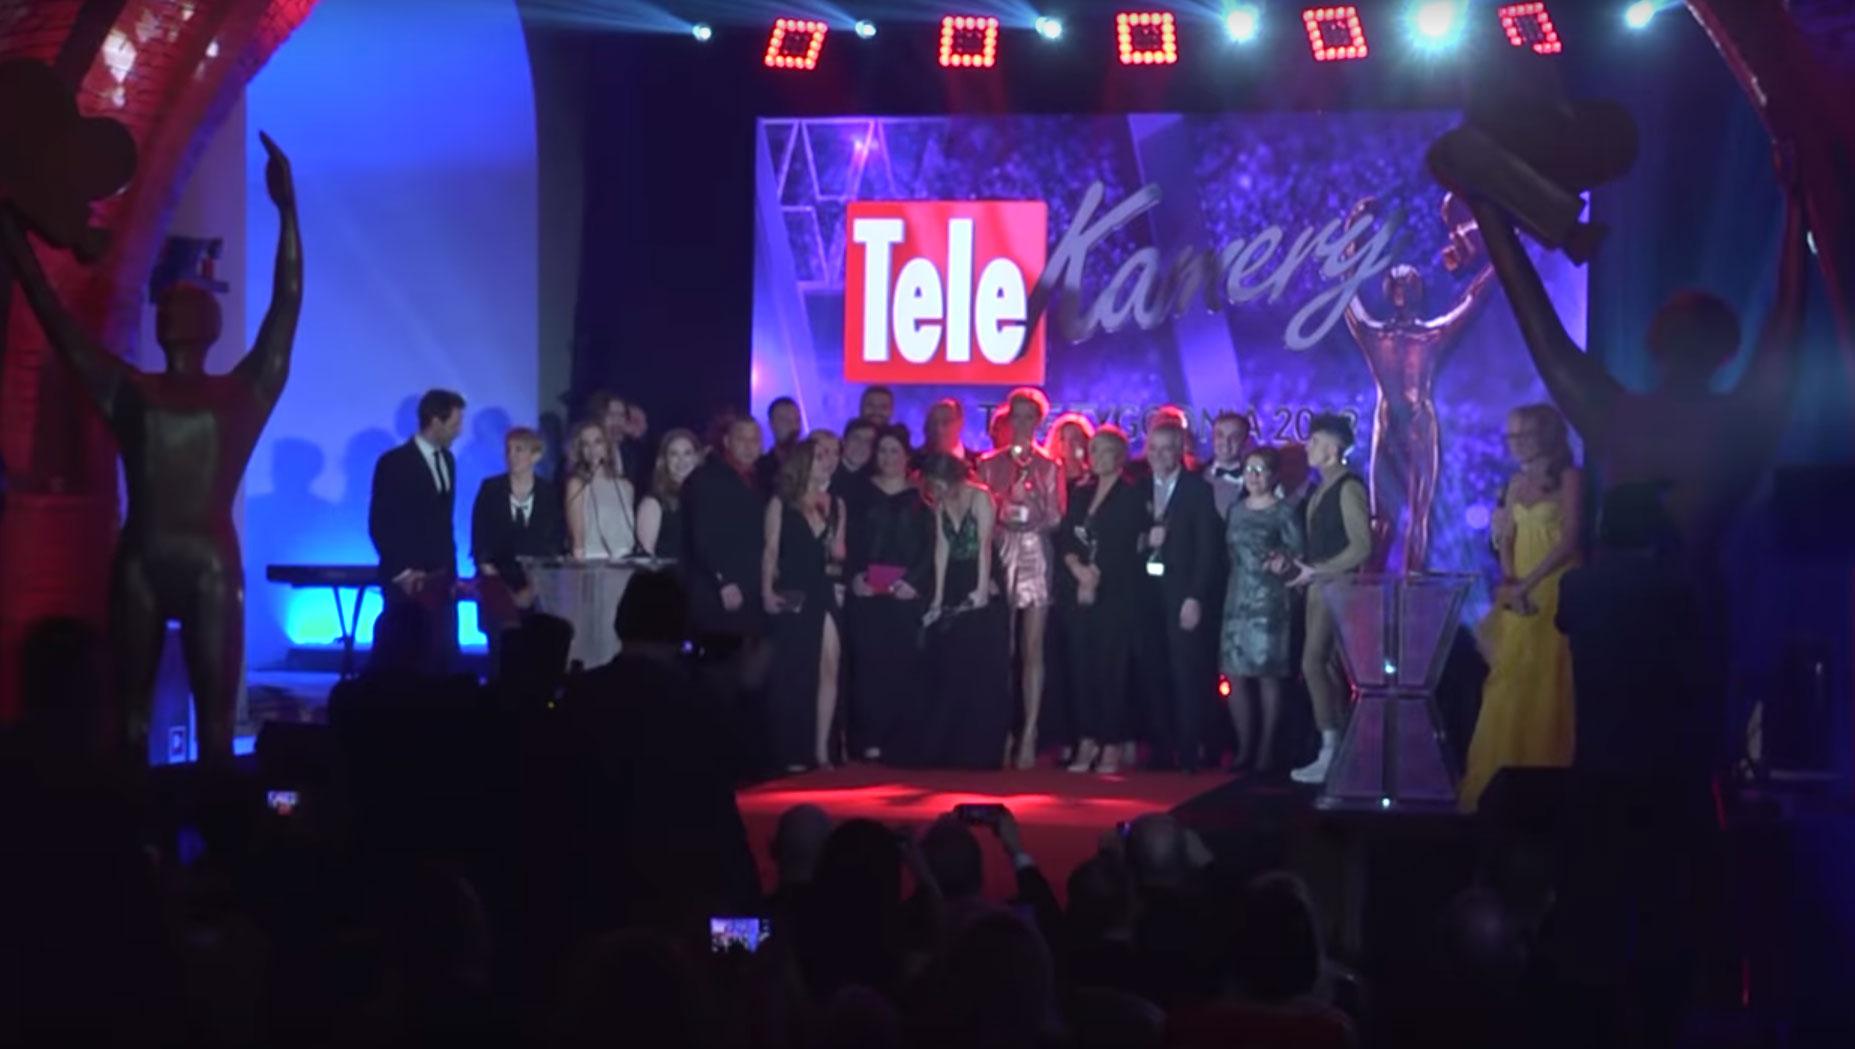 telekamery-2019-